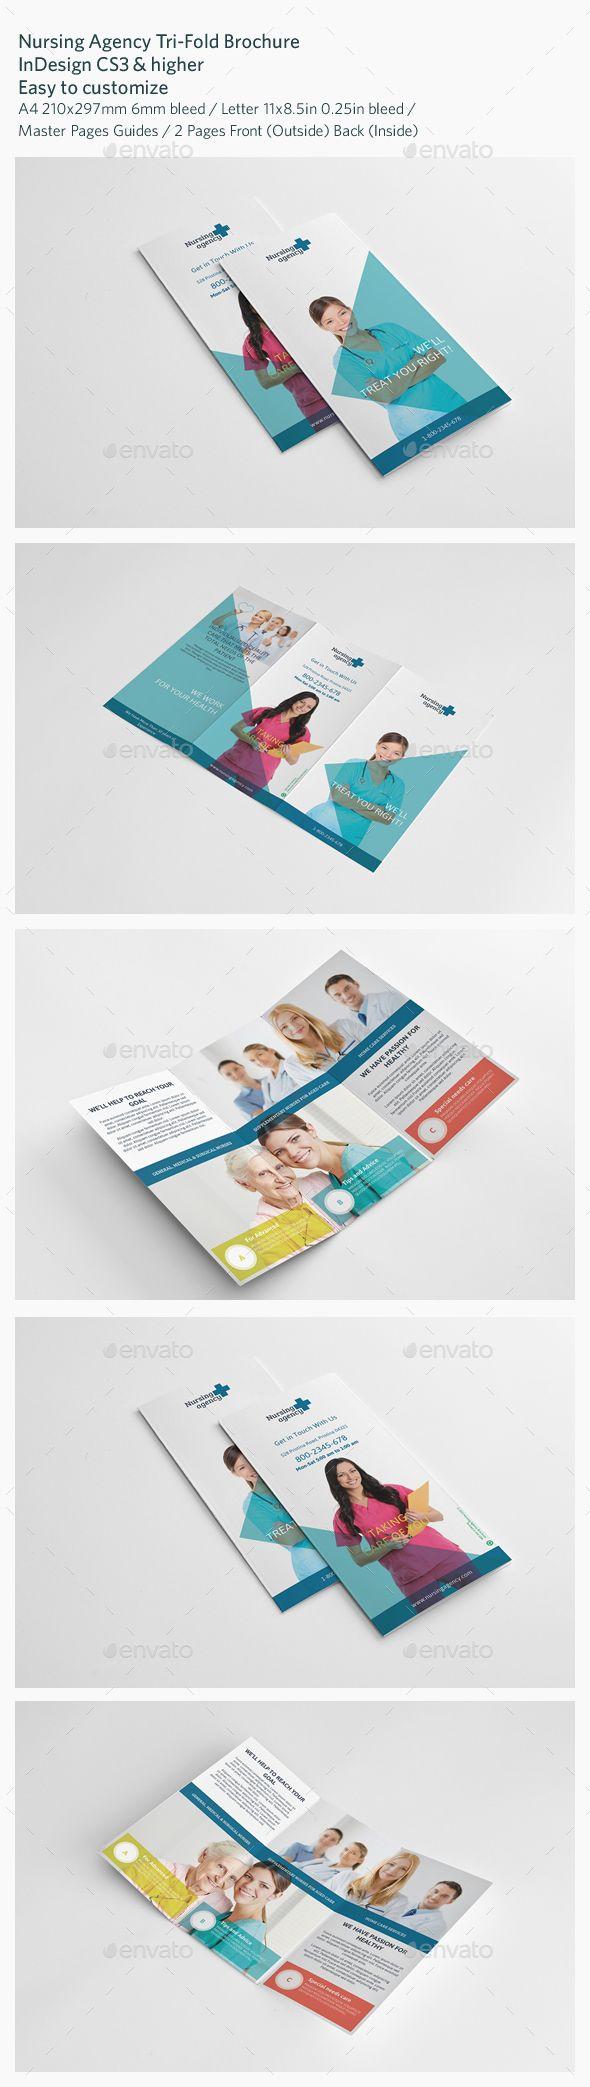 Nursing Agency Trifold Brochure Template #design Download: http://graphicriver.net/item/nursing-agency-trifold-brochure/13436739?ref=ksioks